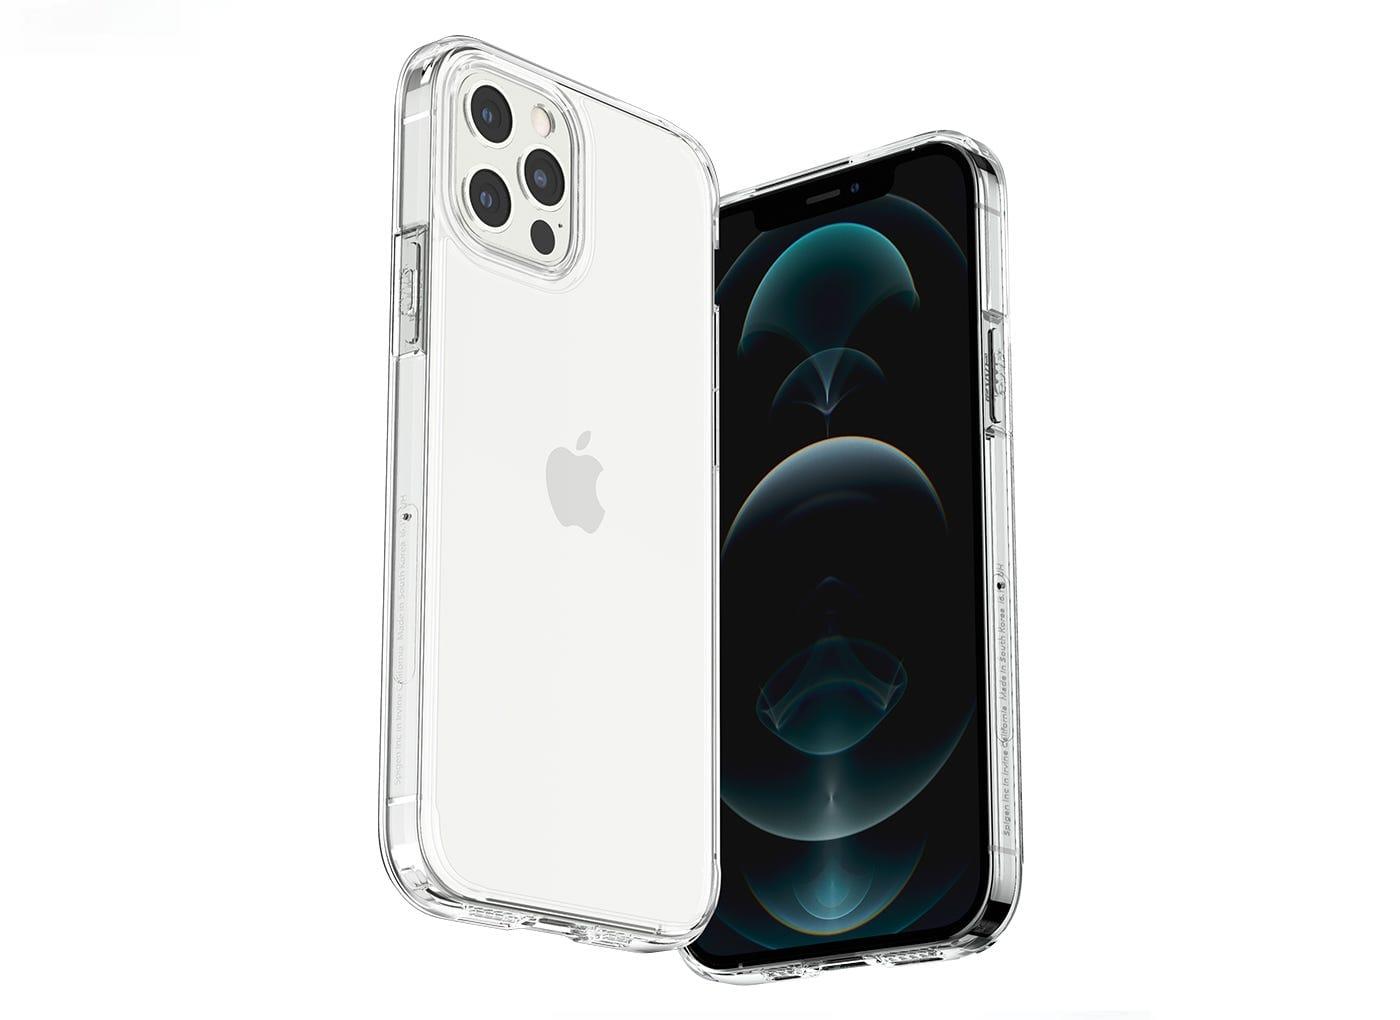 SpigenのiPhone 12シリーズ用ケースなどが割引価格に 8月14日(土)限り